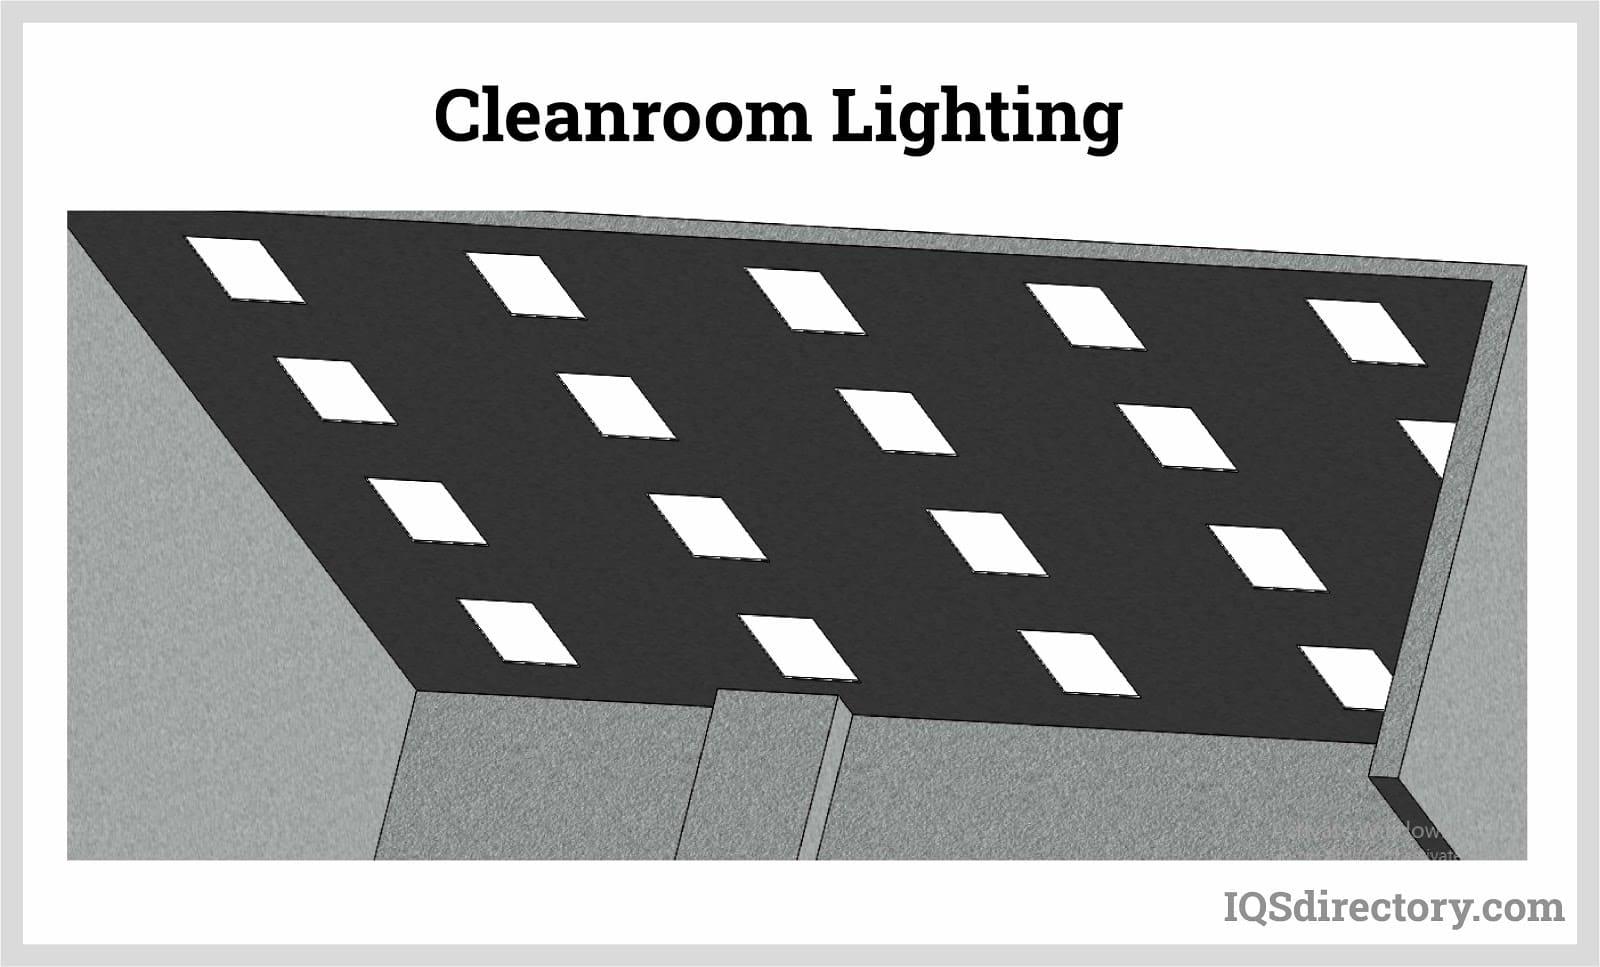 Cleanroom Lighting